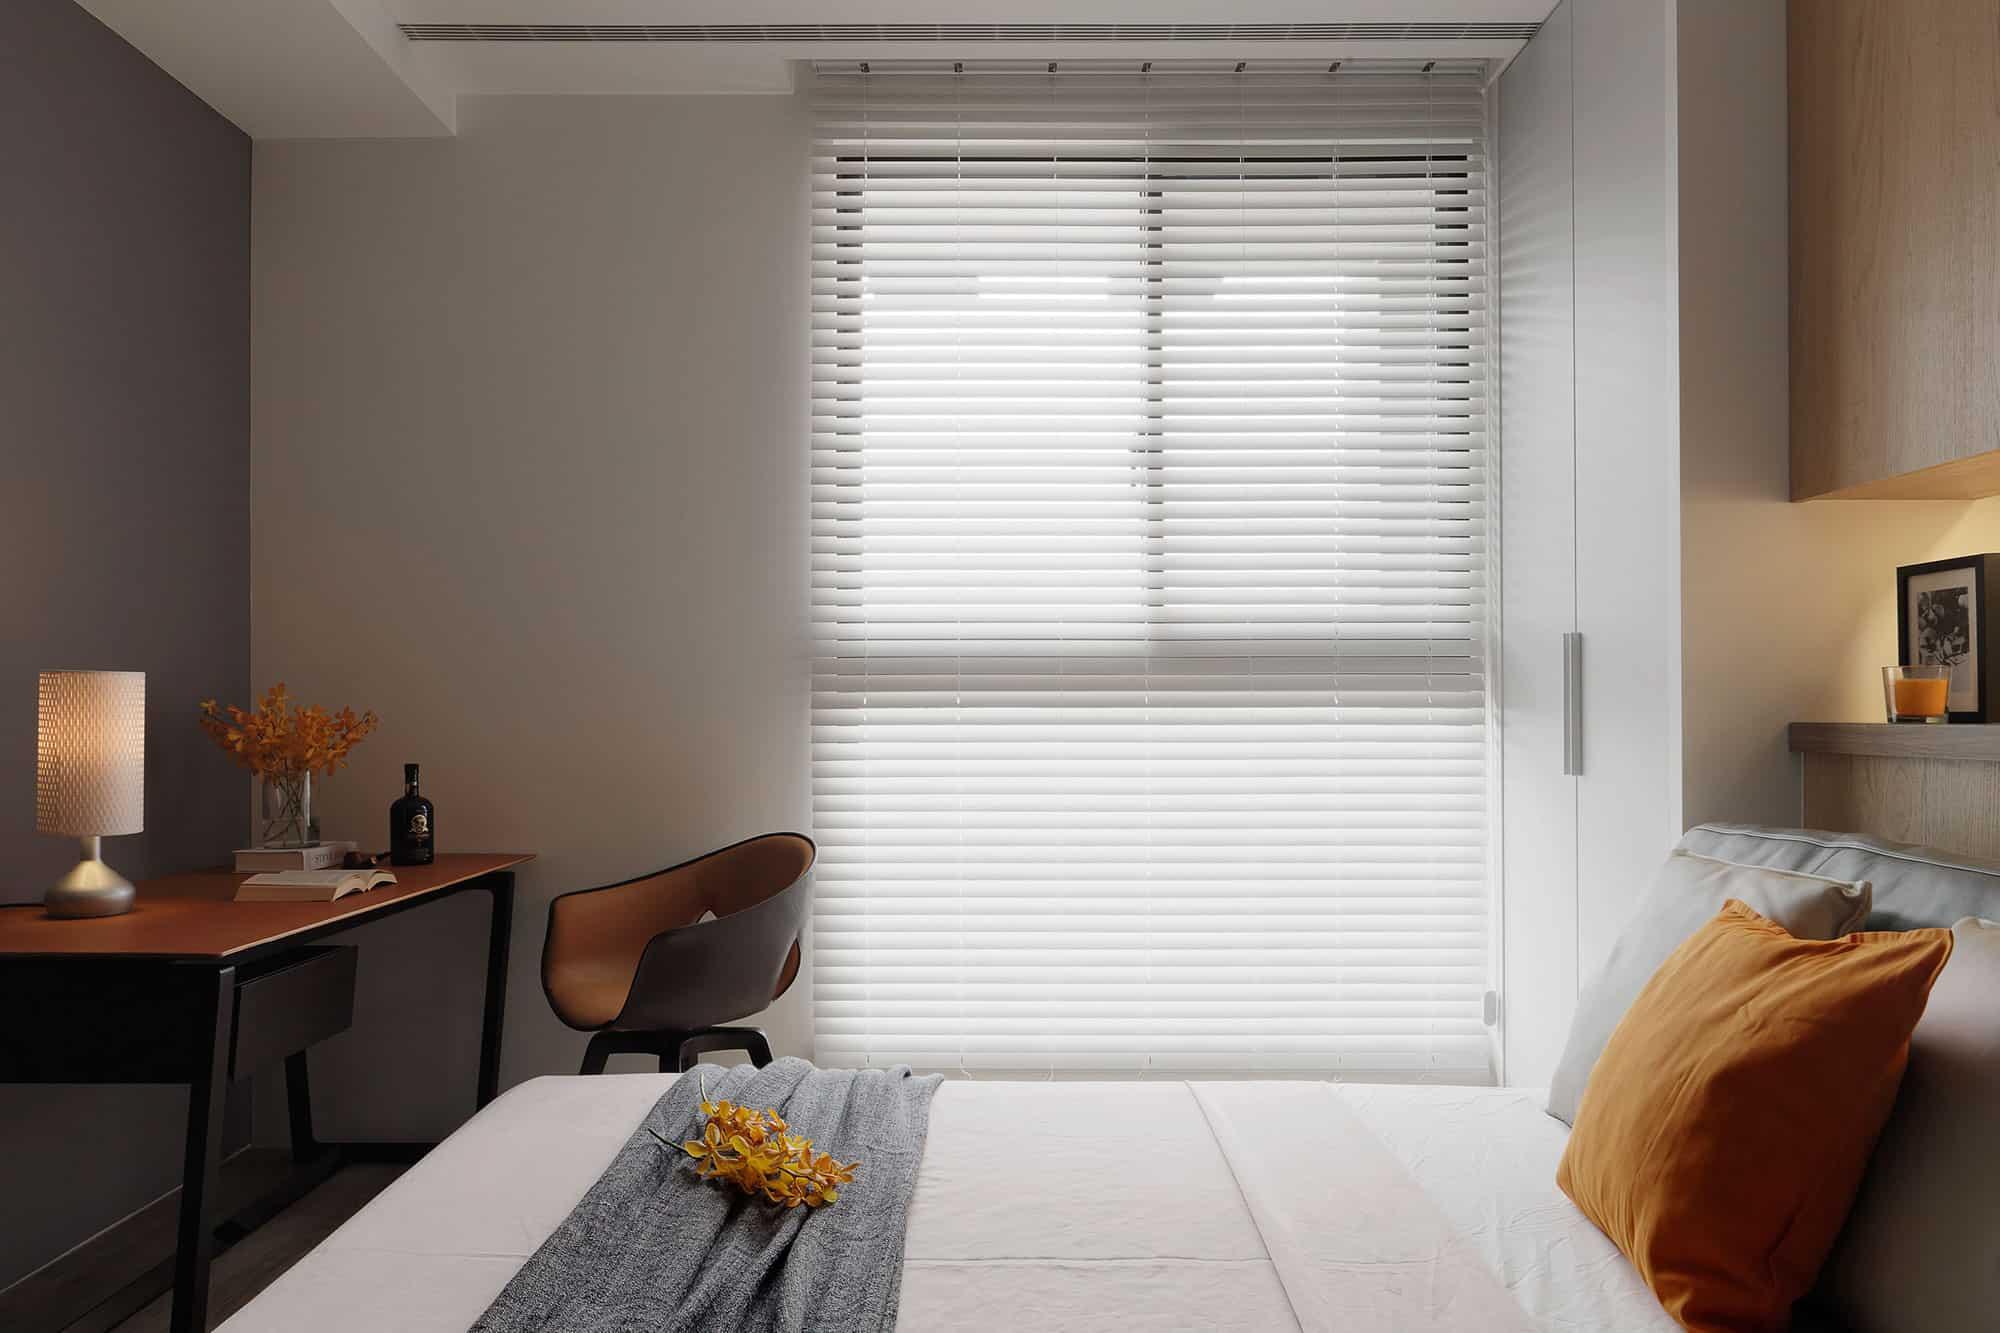 Apartment-from-Summer-Samson-20